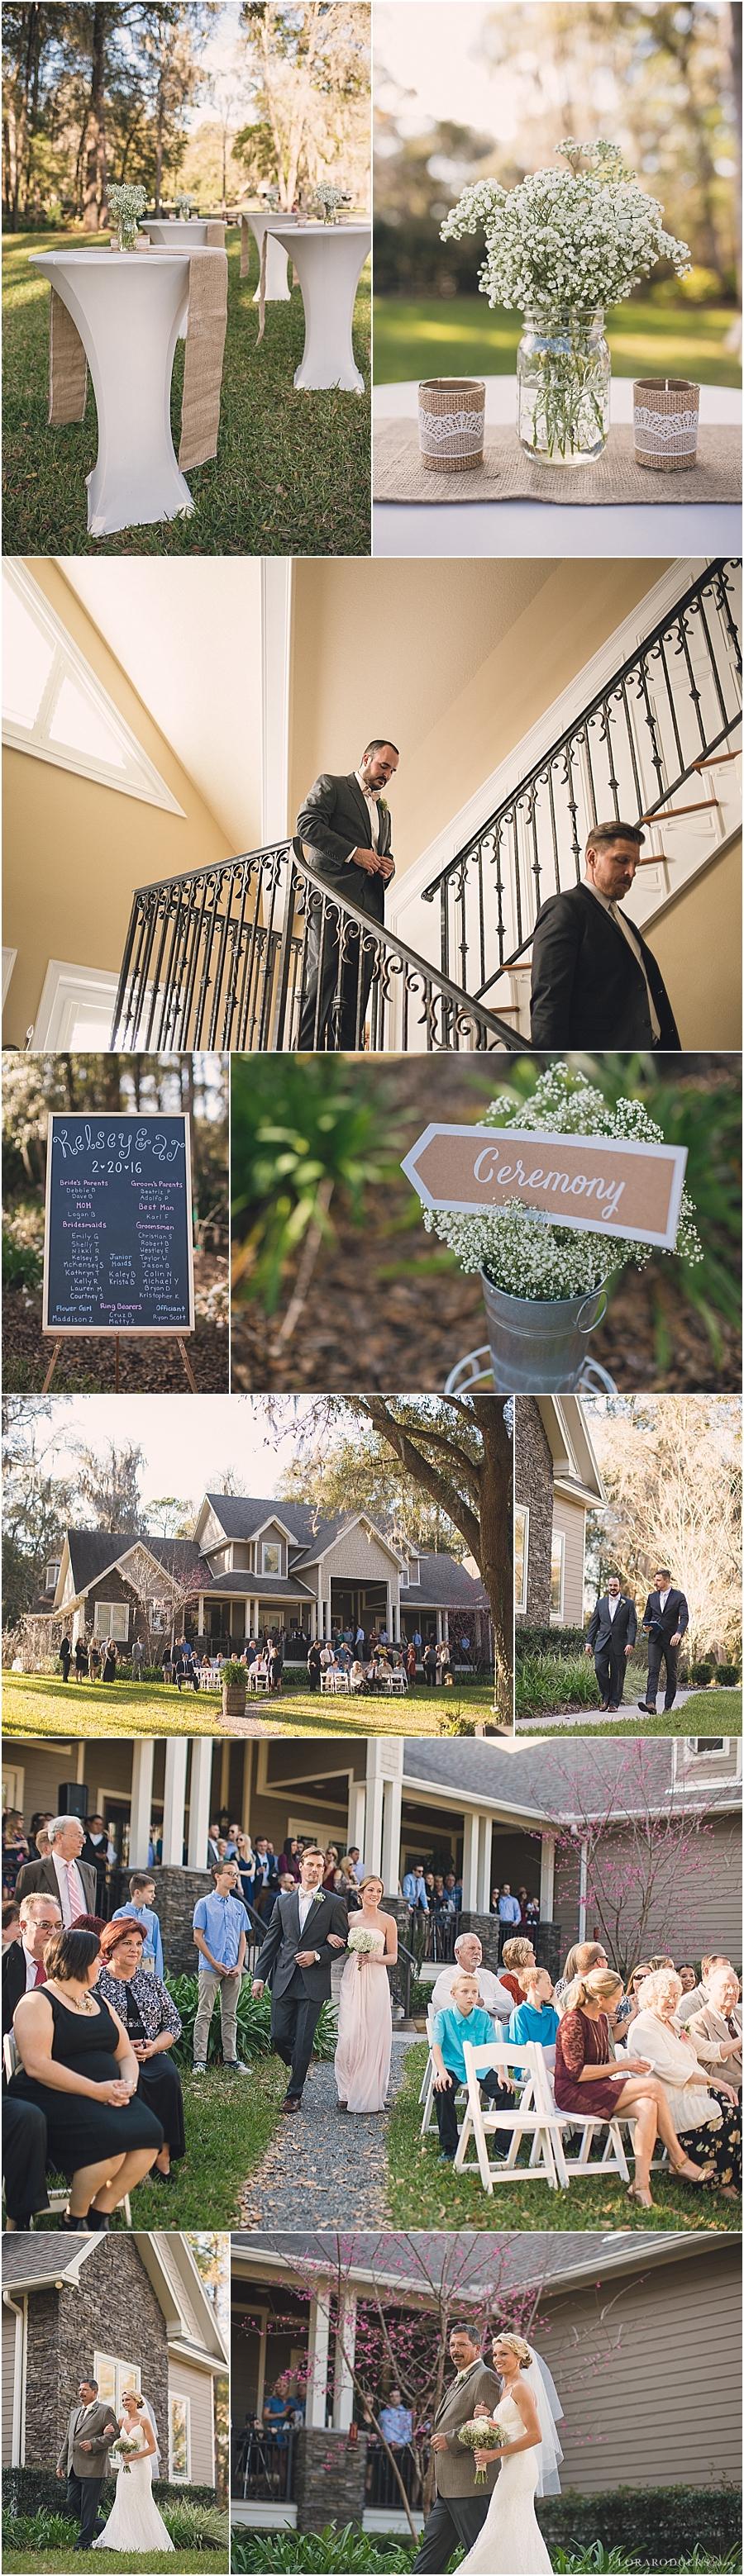 Country_Chic_Ocala_Wedding_006